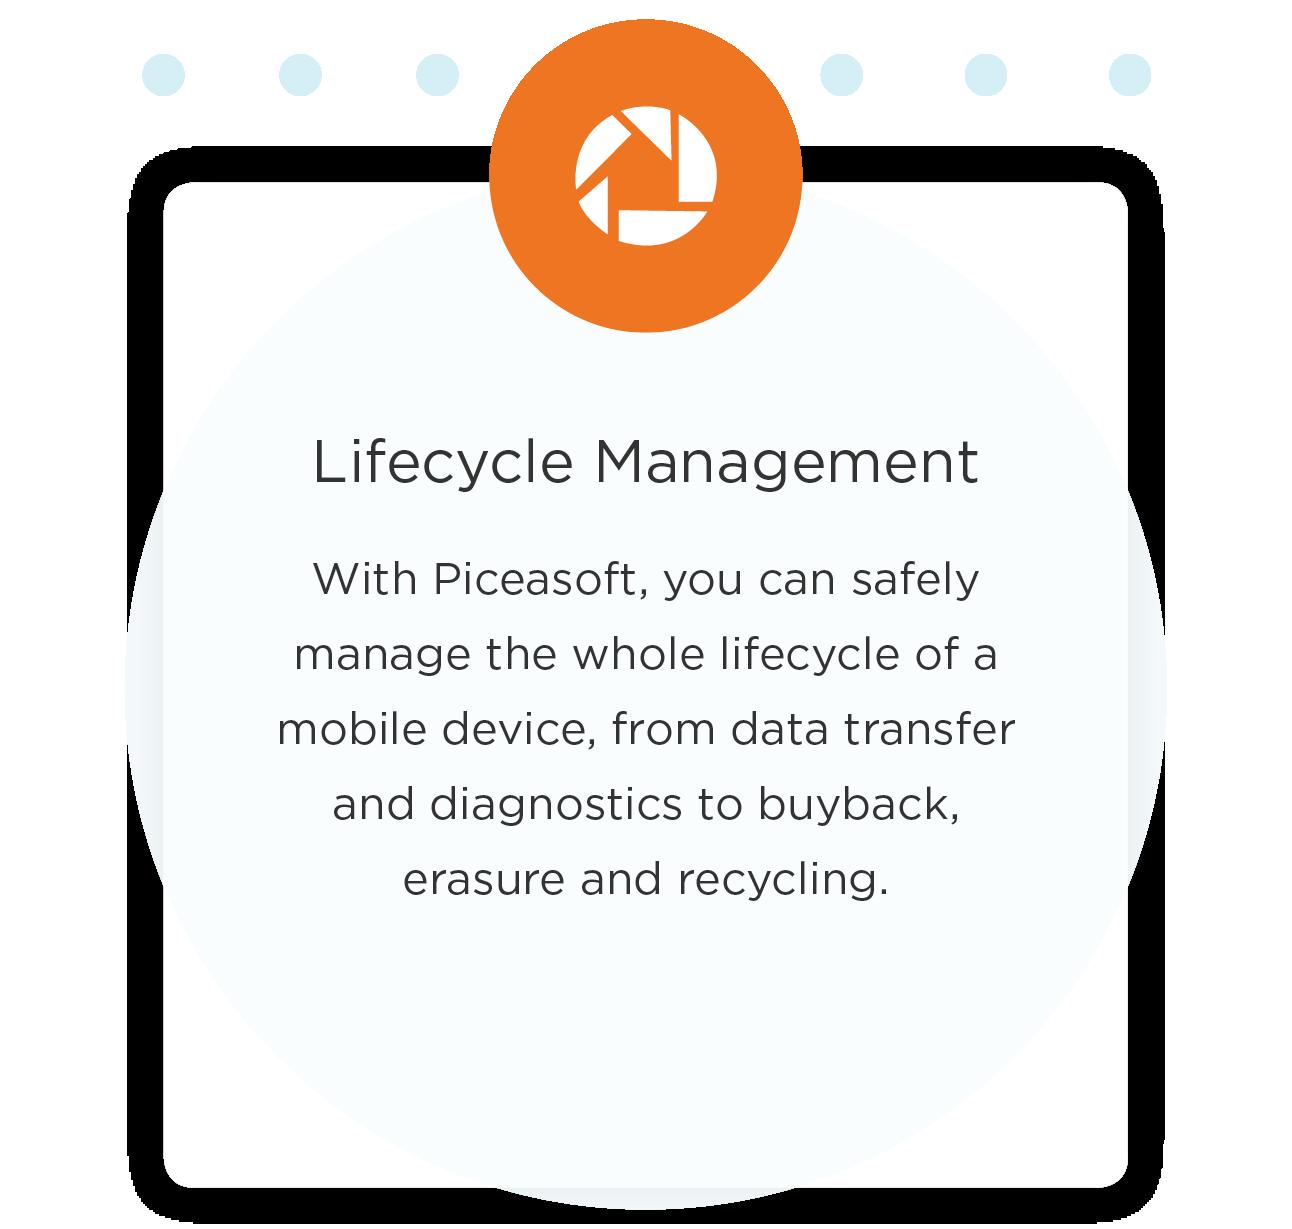 LifecycleManagement2